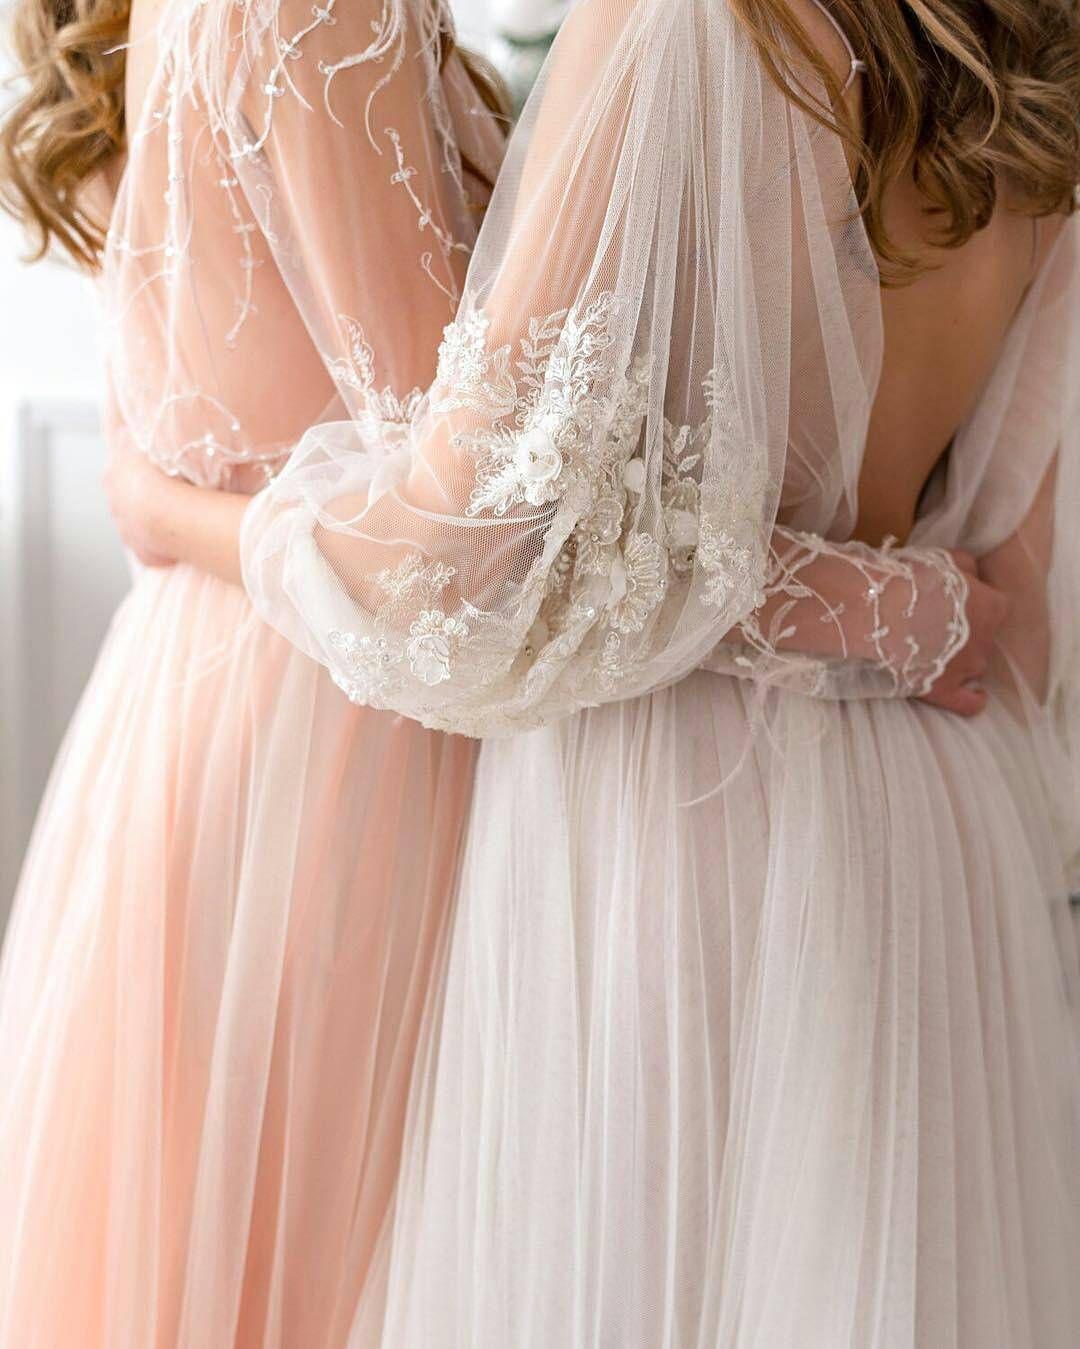 Blush mermaid wedding dress  salonkuraje u gwendolynne  Weddings  Pinterest  Salons Wedding